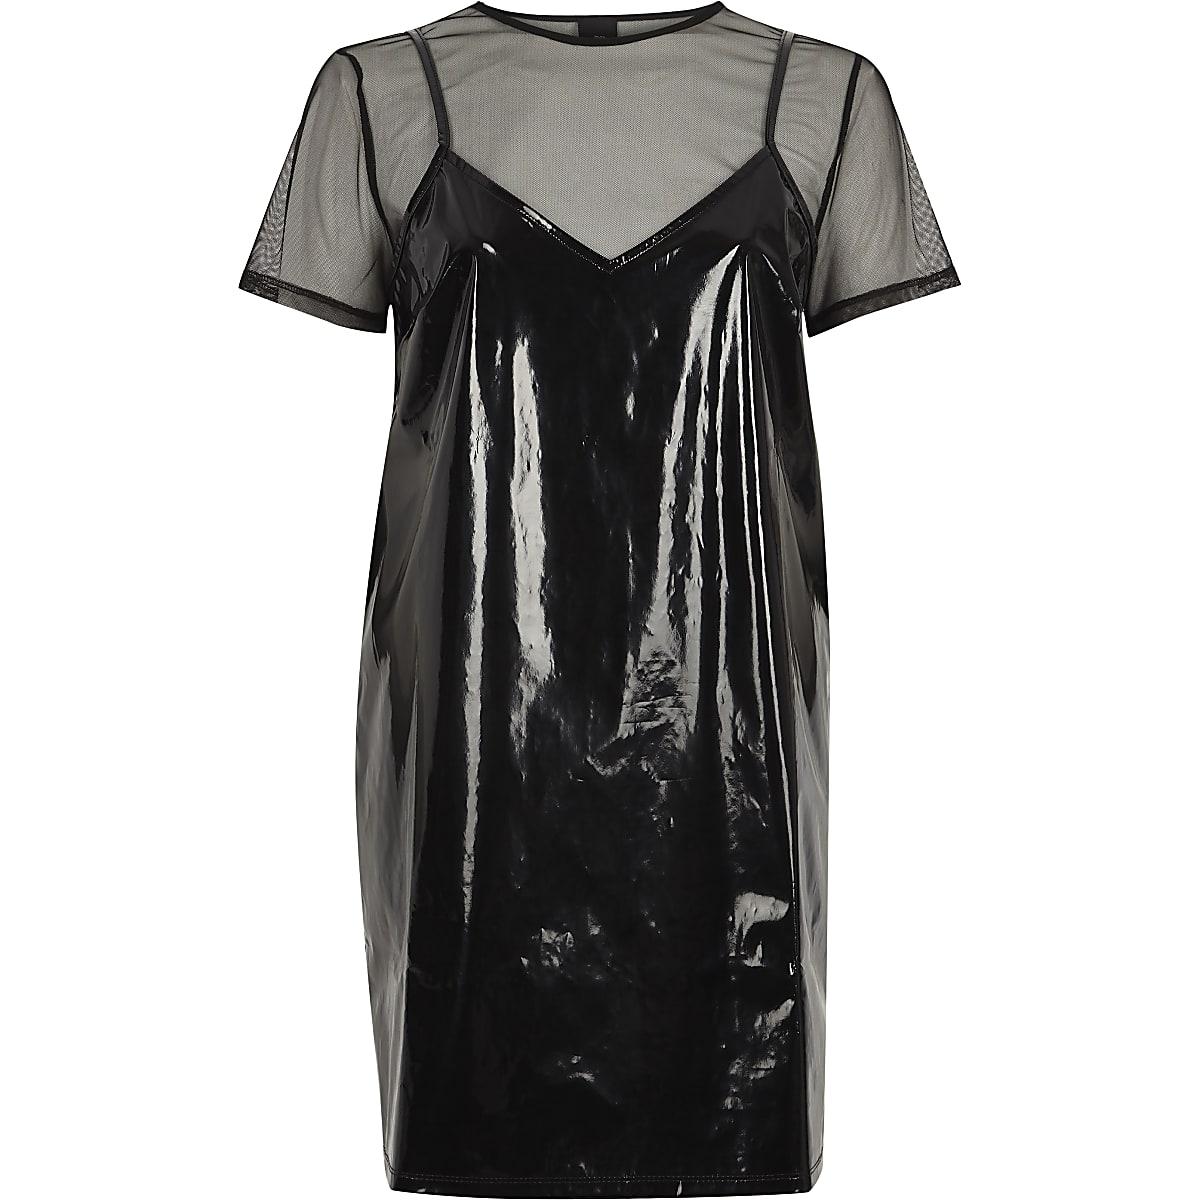 67af46c1ca1 Black vinyl and mesh T-shirt dress - T-Shirt Dresses - Dresses - women